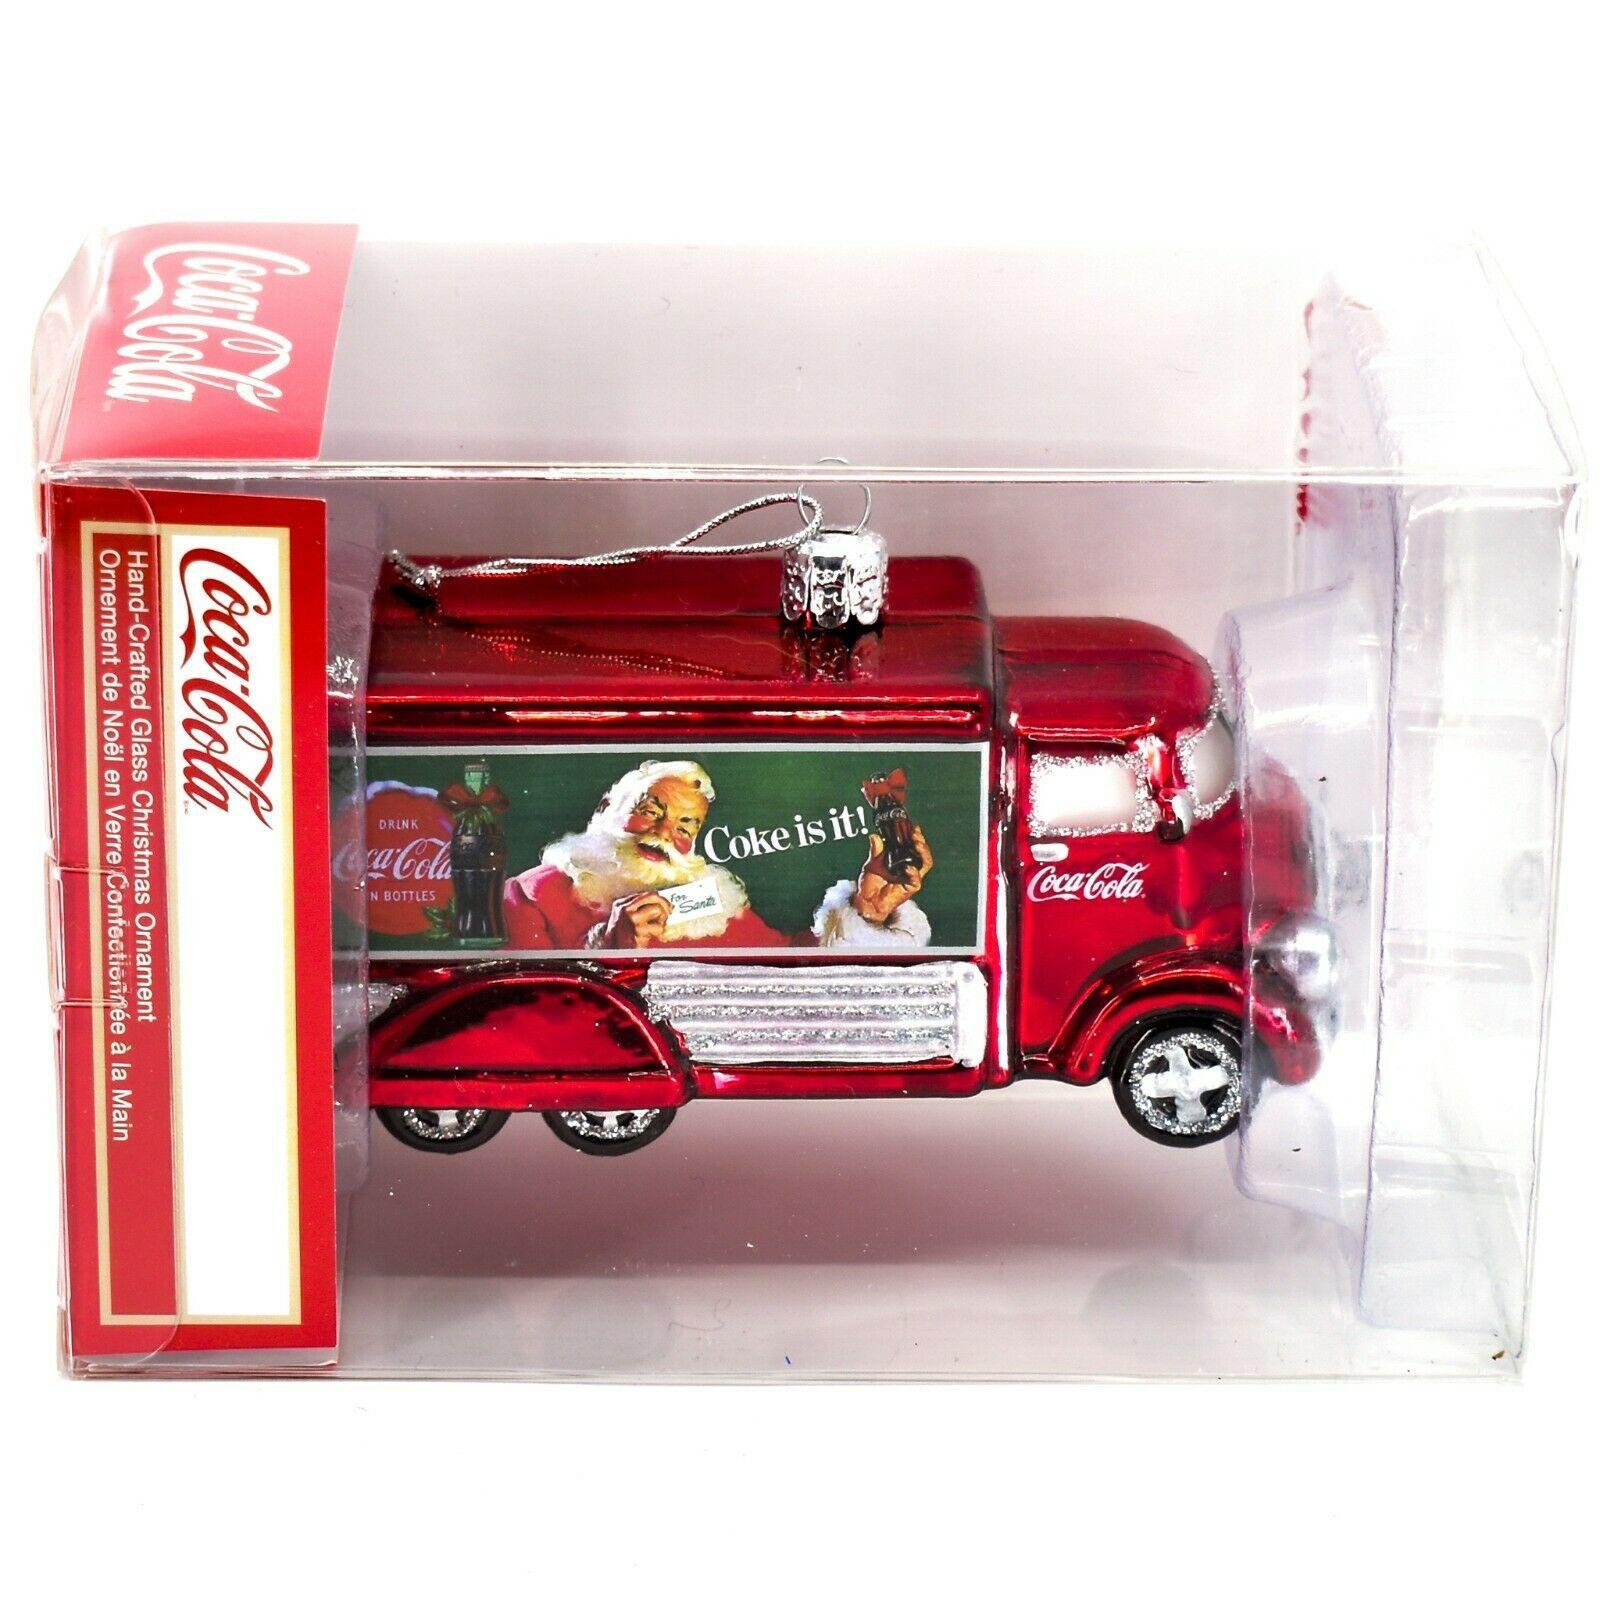 Kurt S Adler Coca-Cola & Santa Delivery Truck Hand-Crafted Glass Ornament CC4151